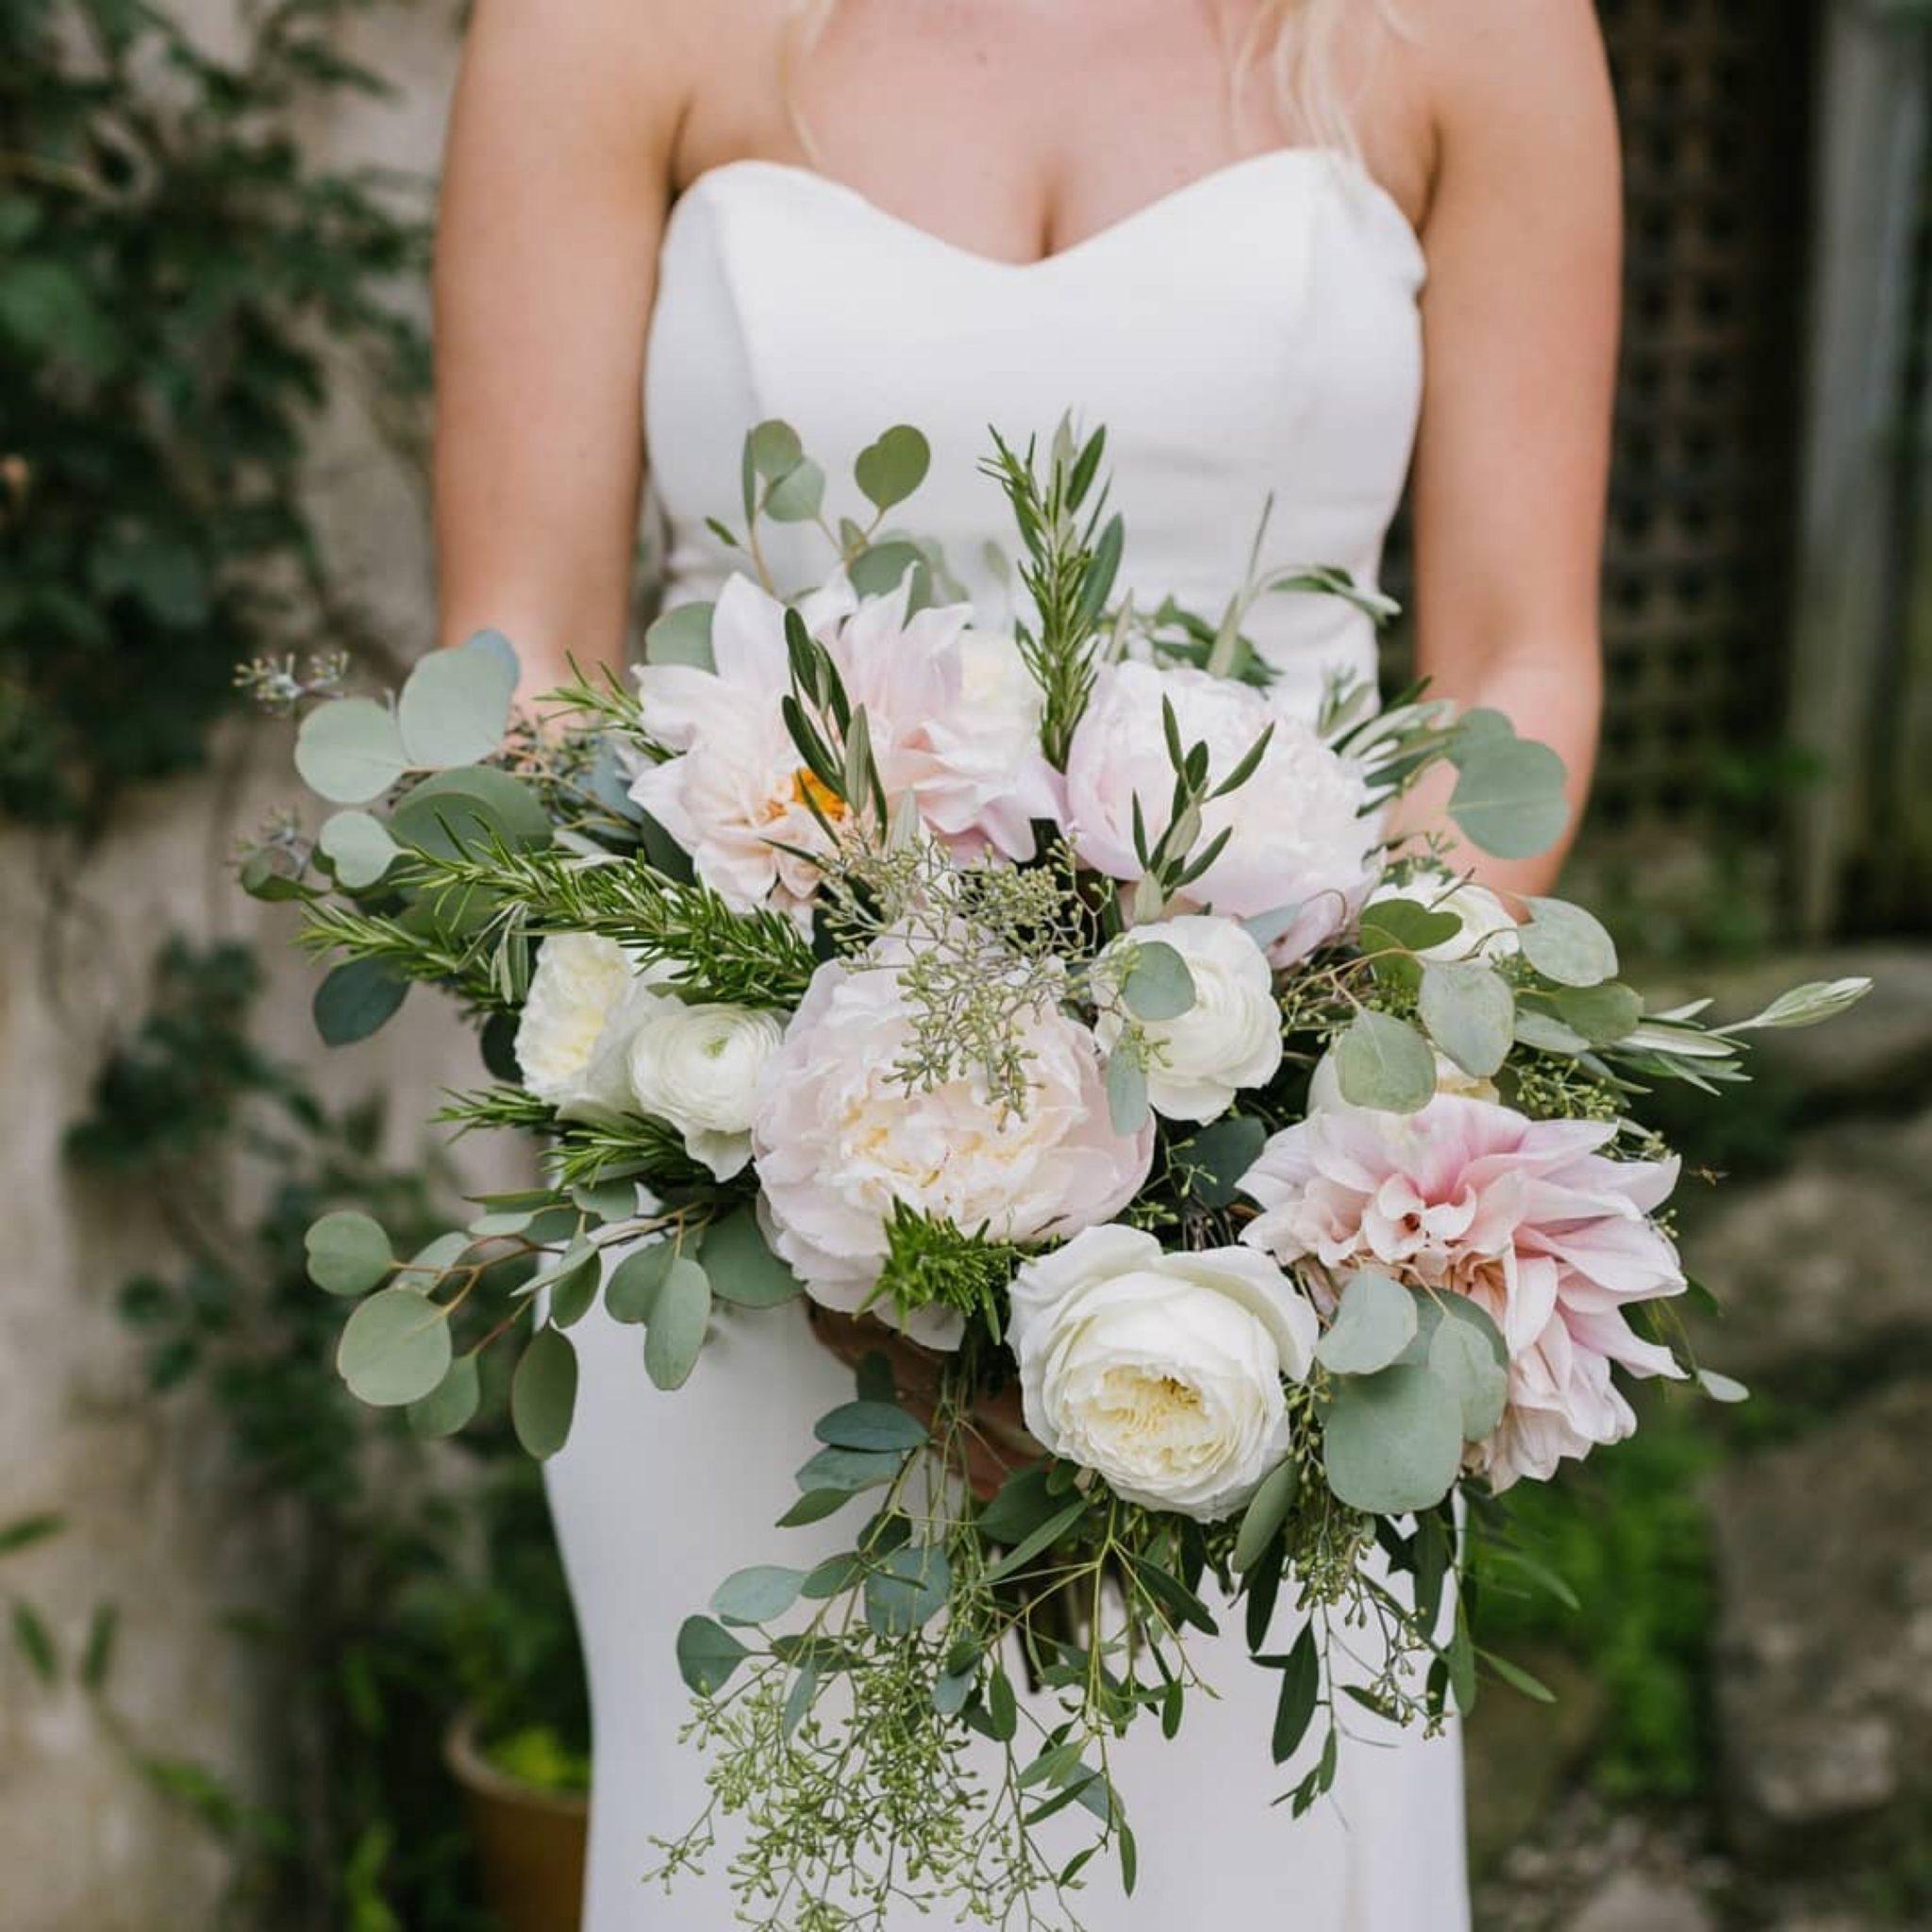 Bridal_bouquet_wedding_flowers_wedding_bouquet_dayton_cincinnat_florist_wedding_preservation